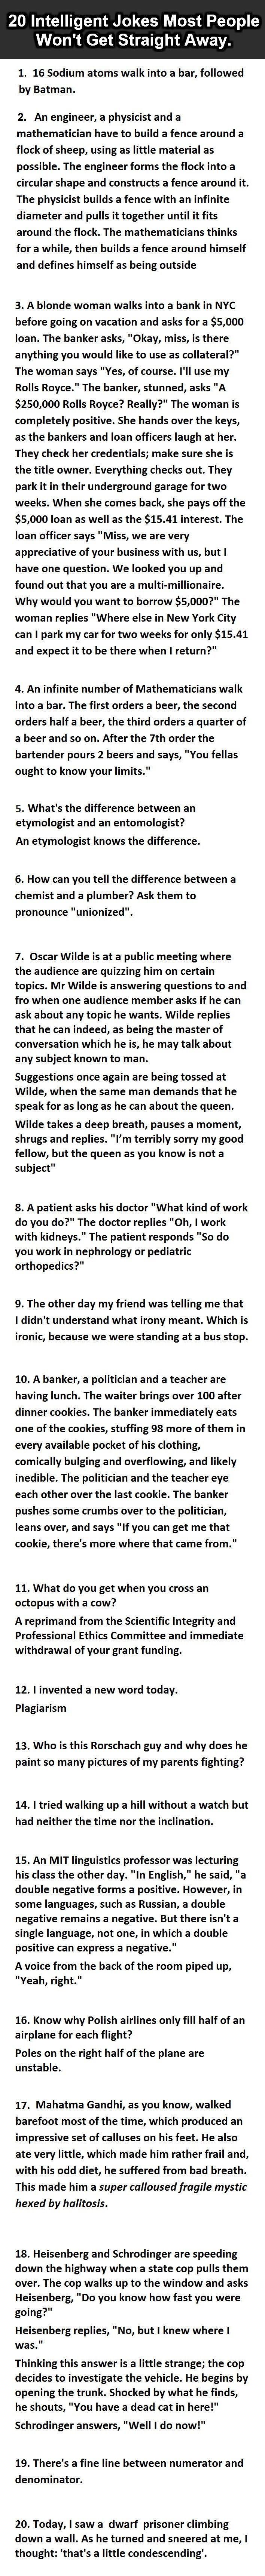 20 Intelligent Jokes Most People Won't Get Straight Away.